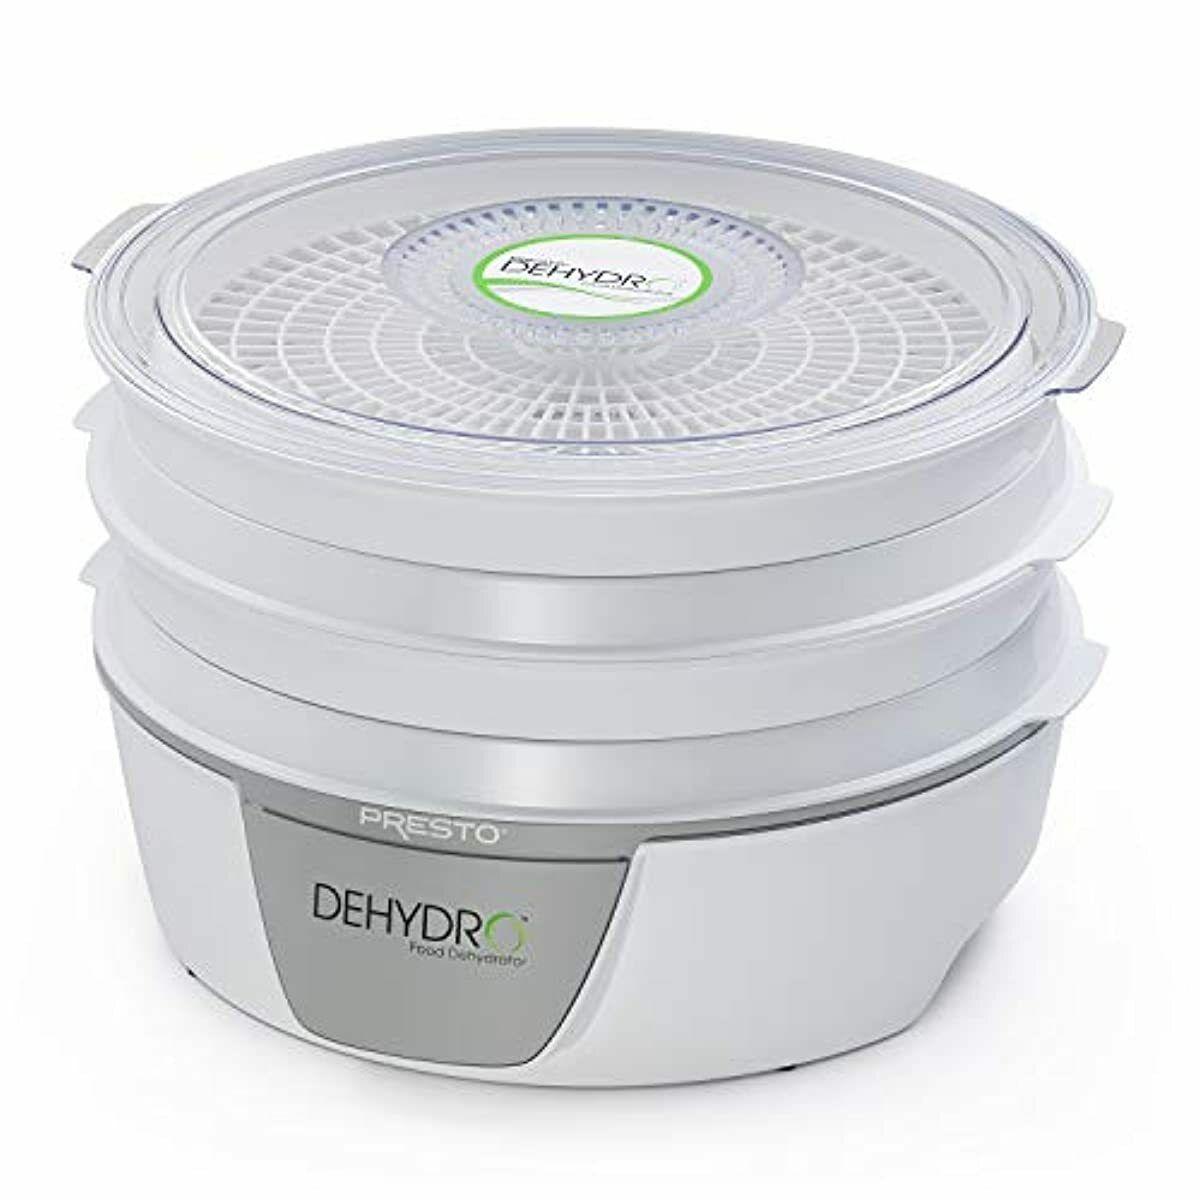 Presto 06300 Dehydro Electric Food Dehydrator, Standard